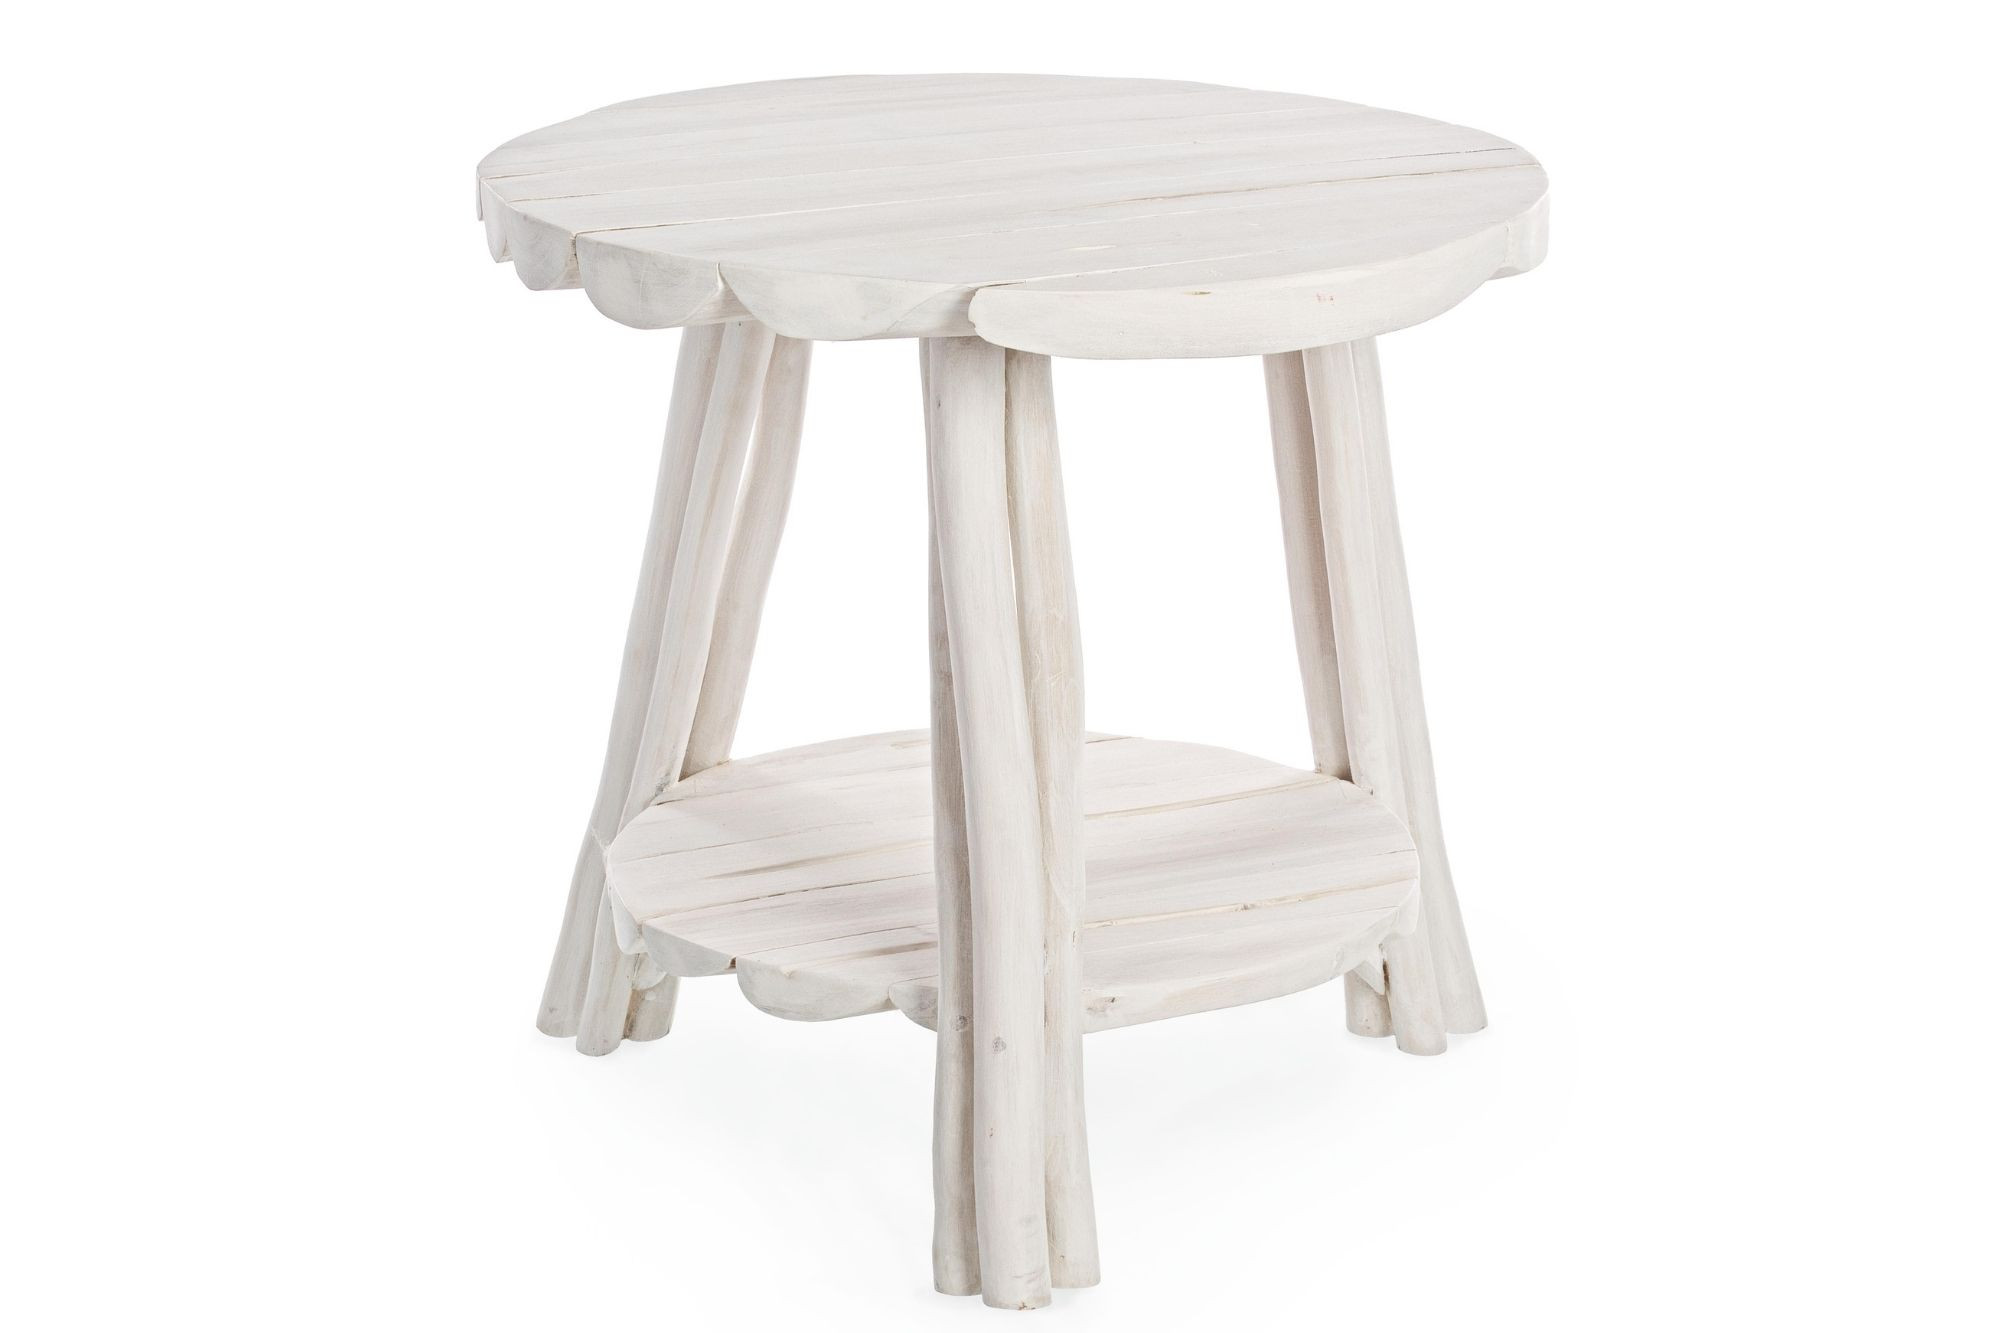 Table basse ronde en teck blanchi